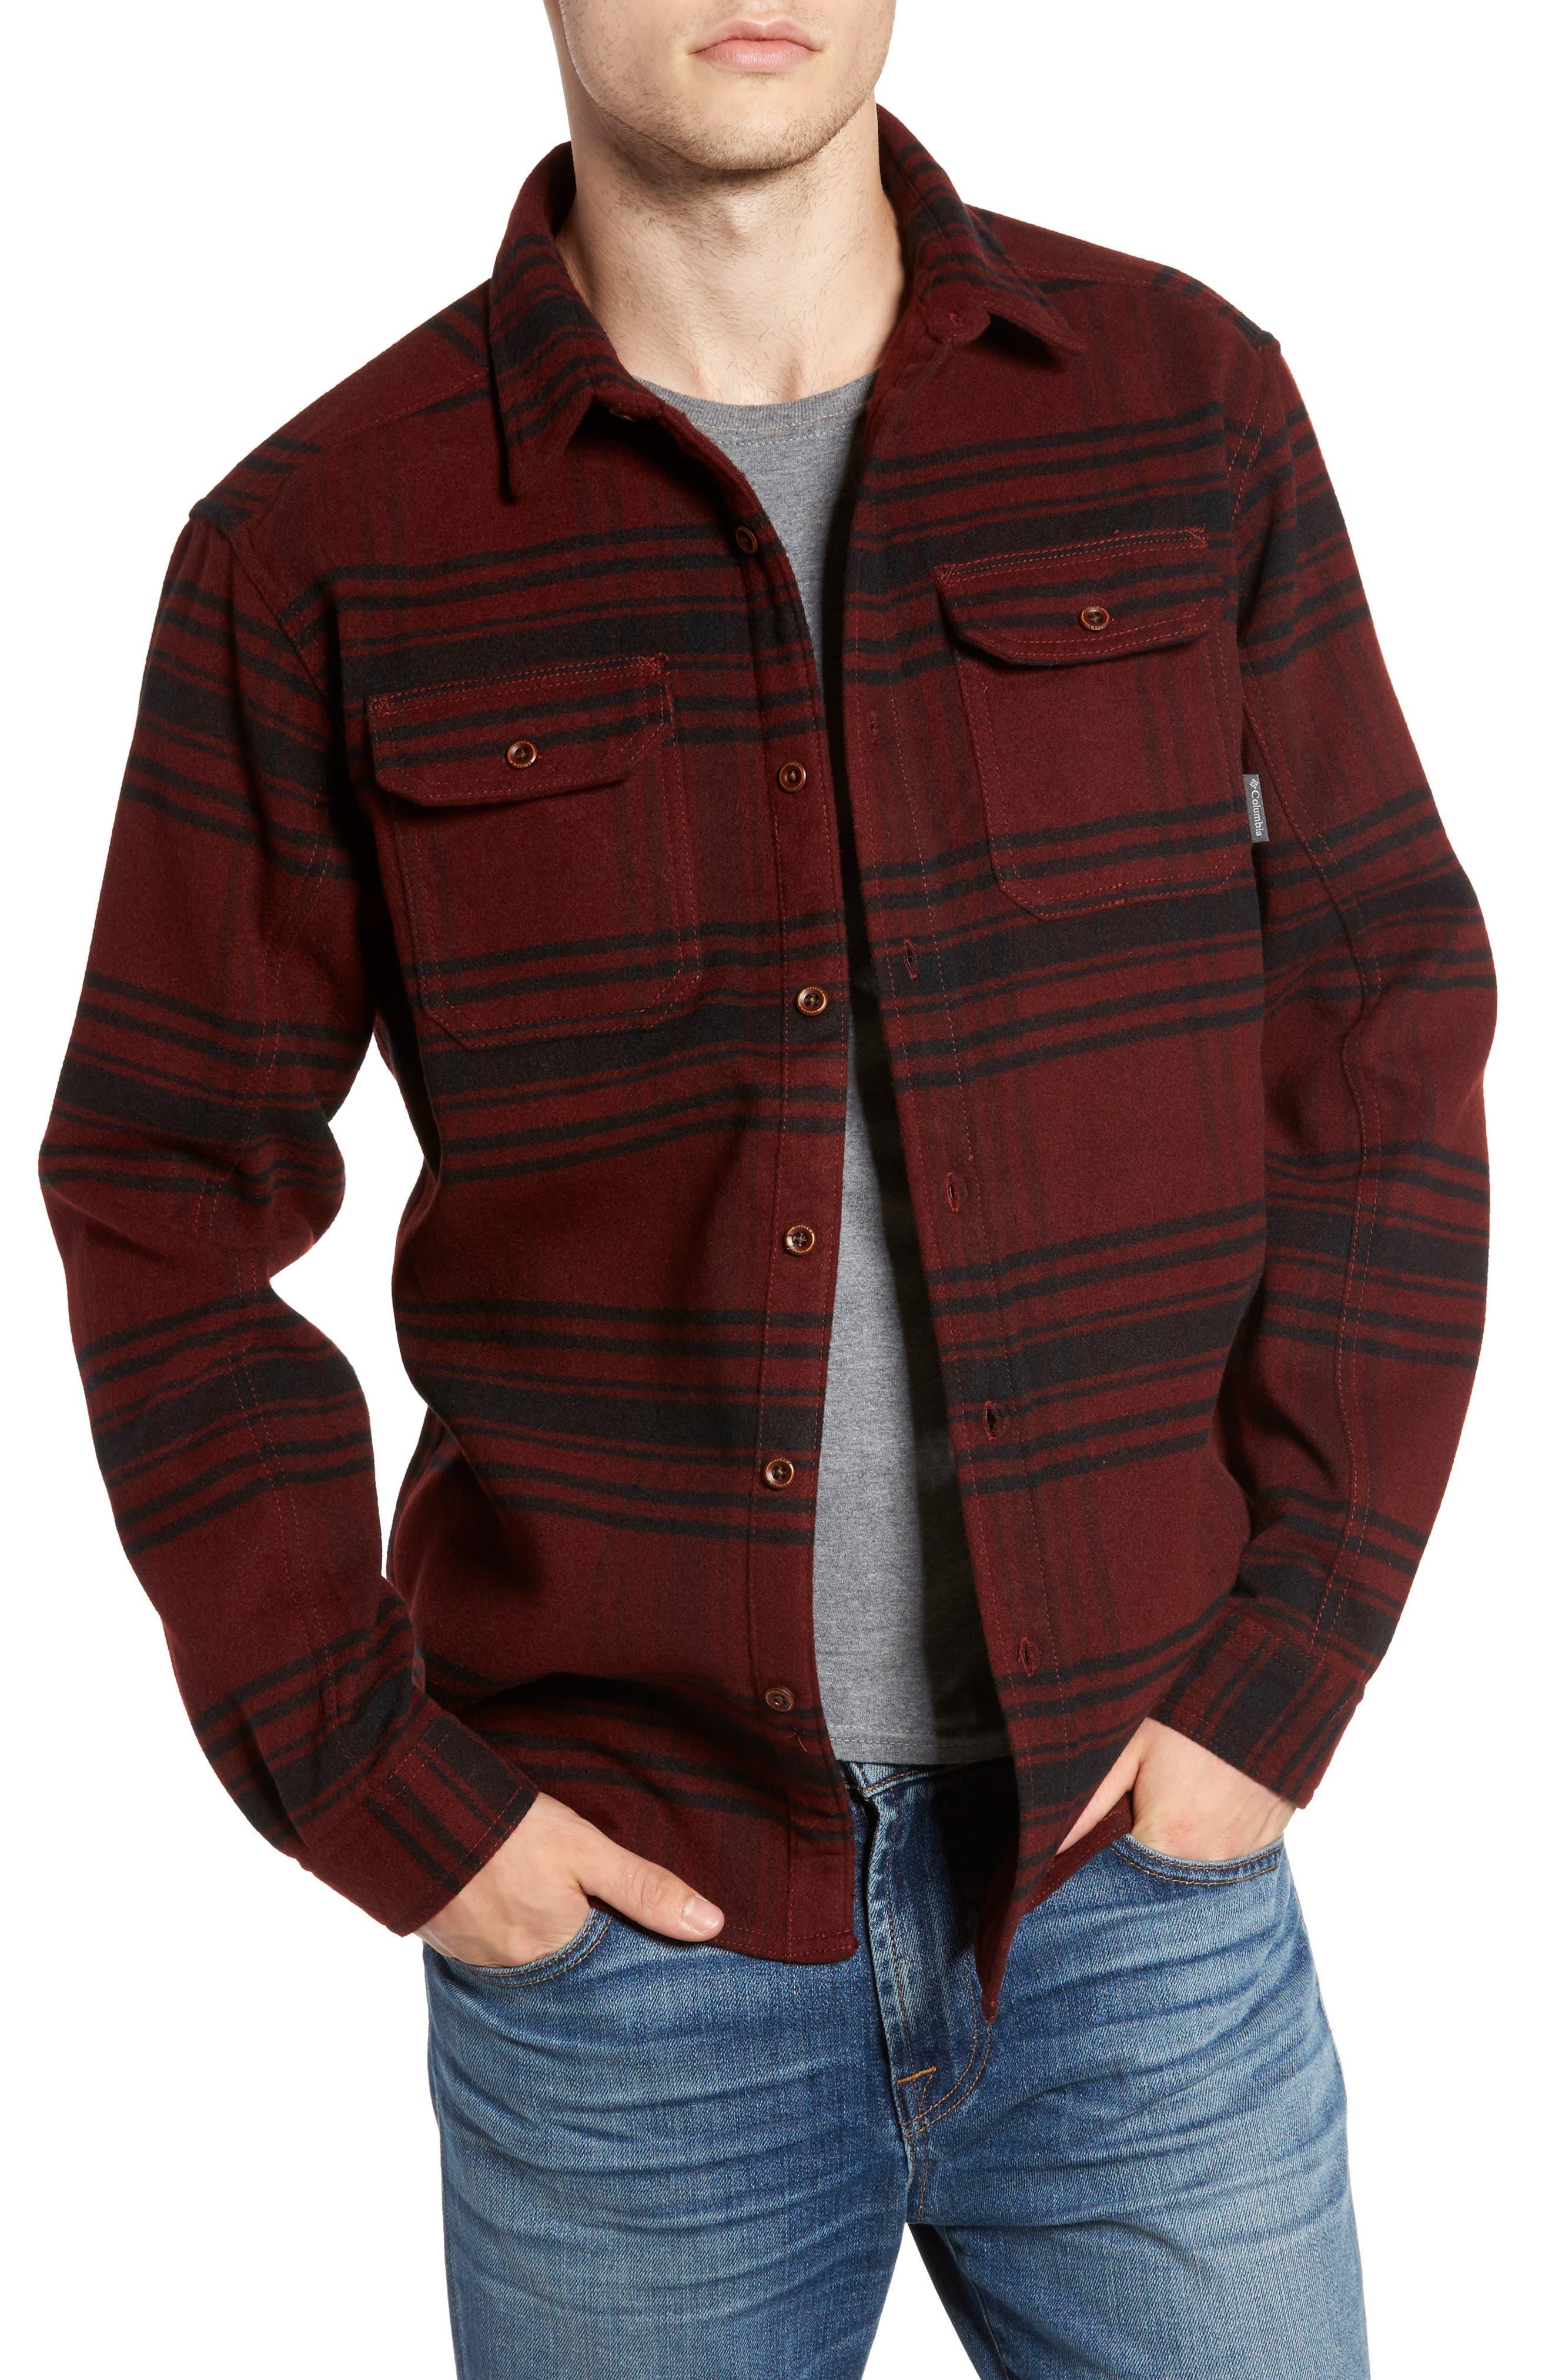 Main Image - Columbia Deschutes River™ Heavyweight Flannel Shirt Jacket